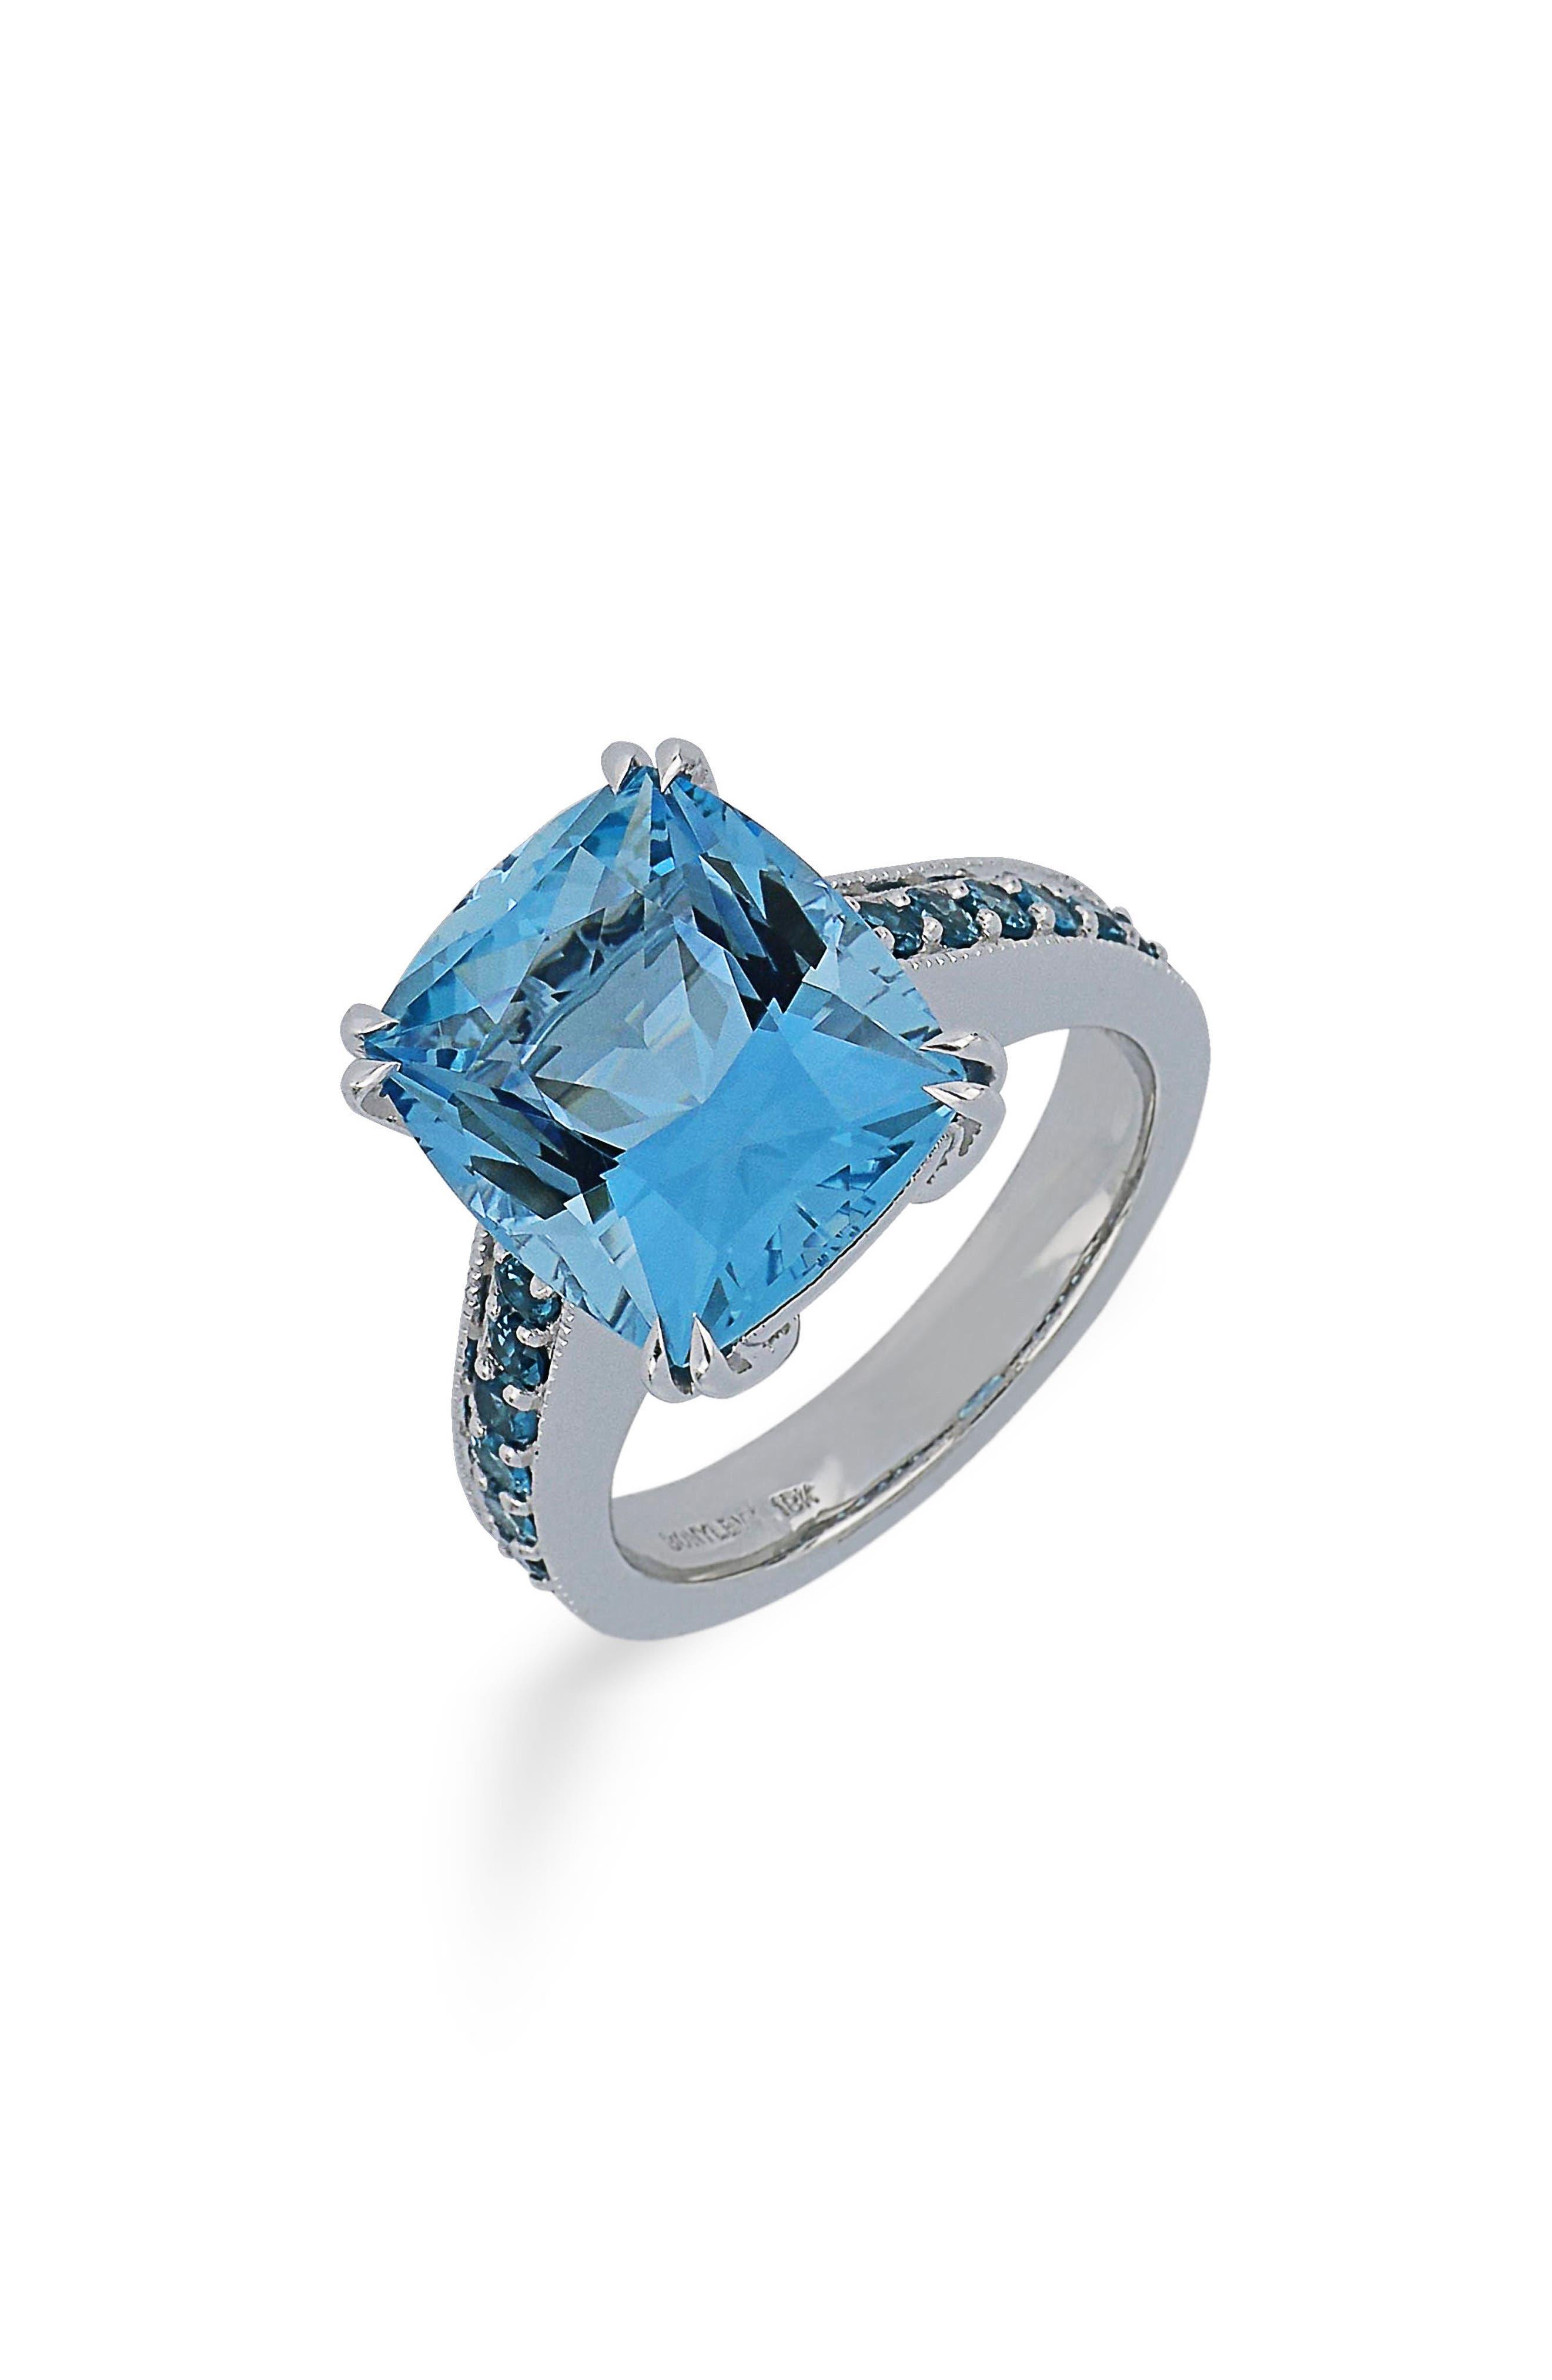 Aquamarine & Blue Topaz Ring,                         Main,                         color, White Gold